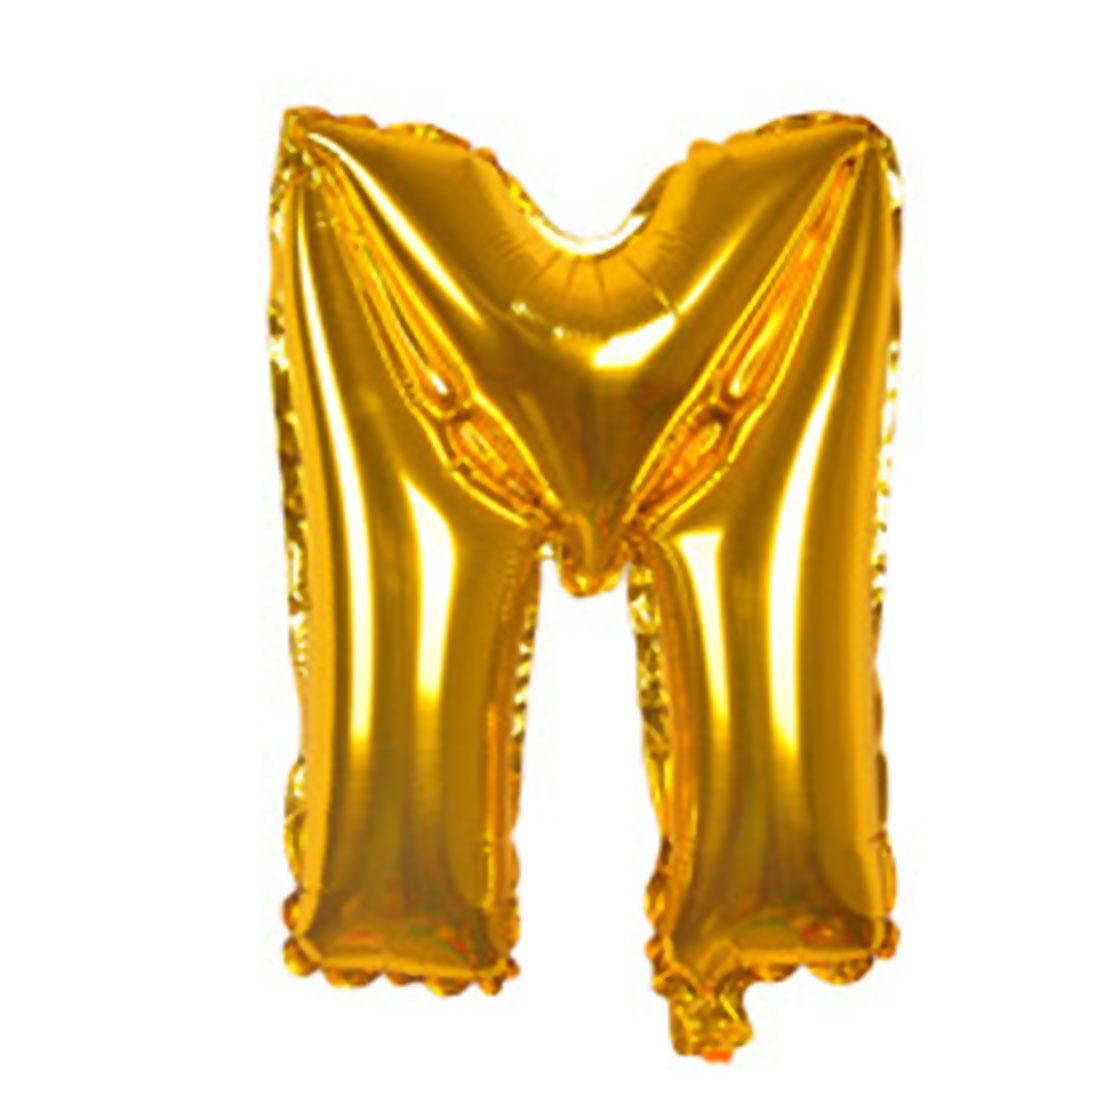 "Unique Bargains 40"" Gold Tone Foil Letter M Balloon Helium Birthday Wedding Festival Decor"